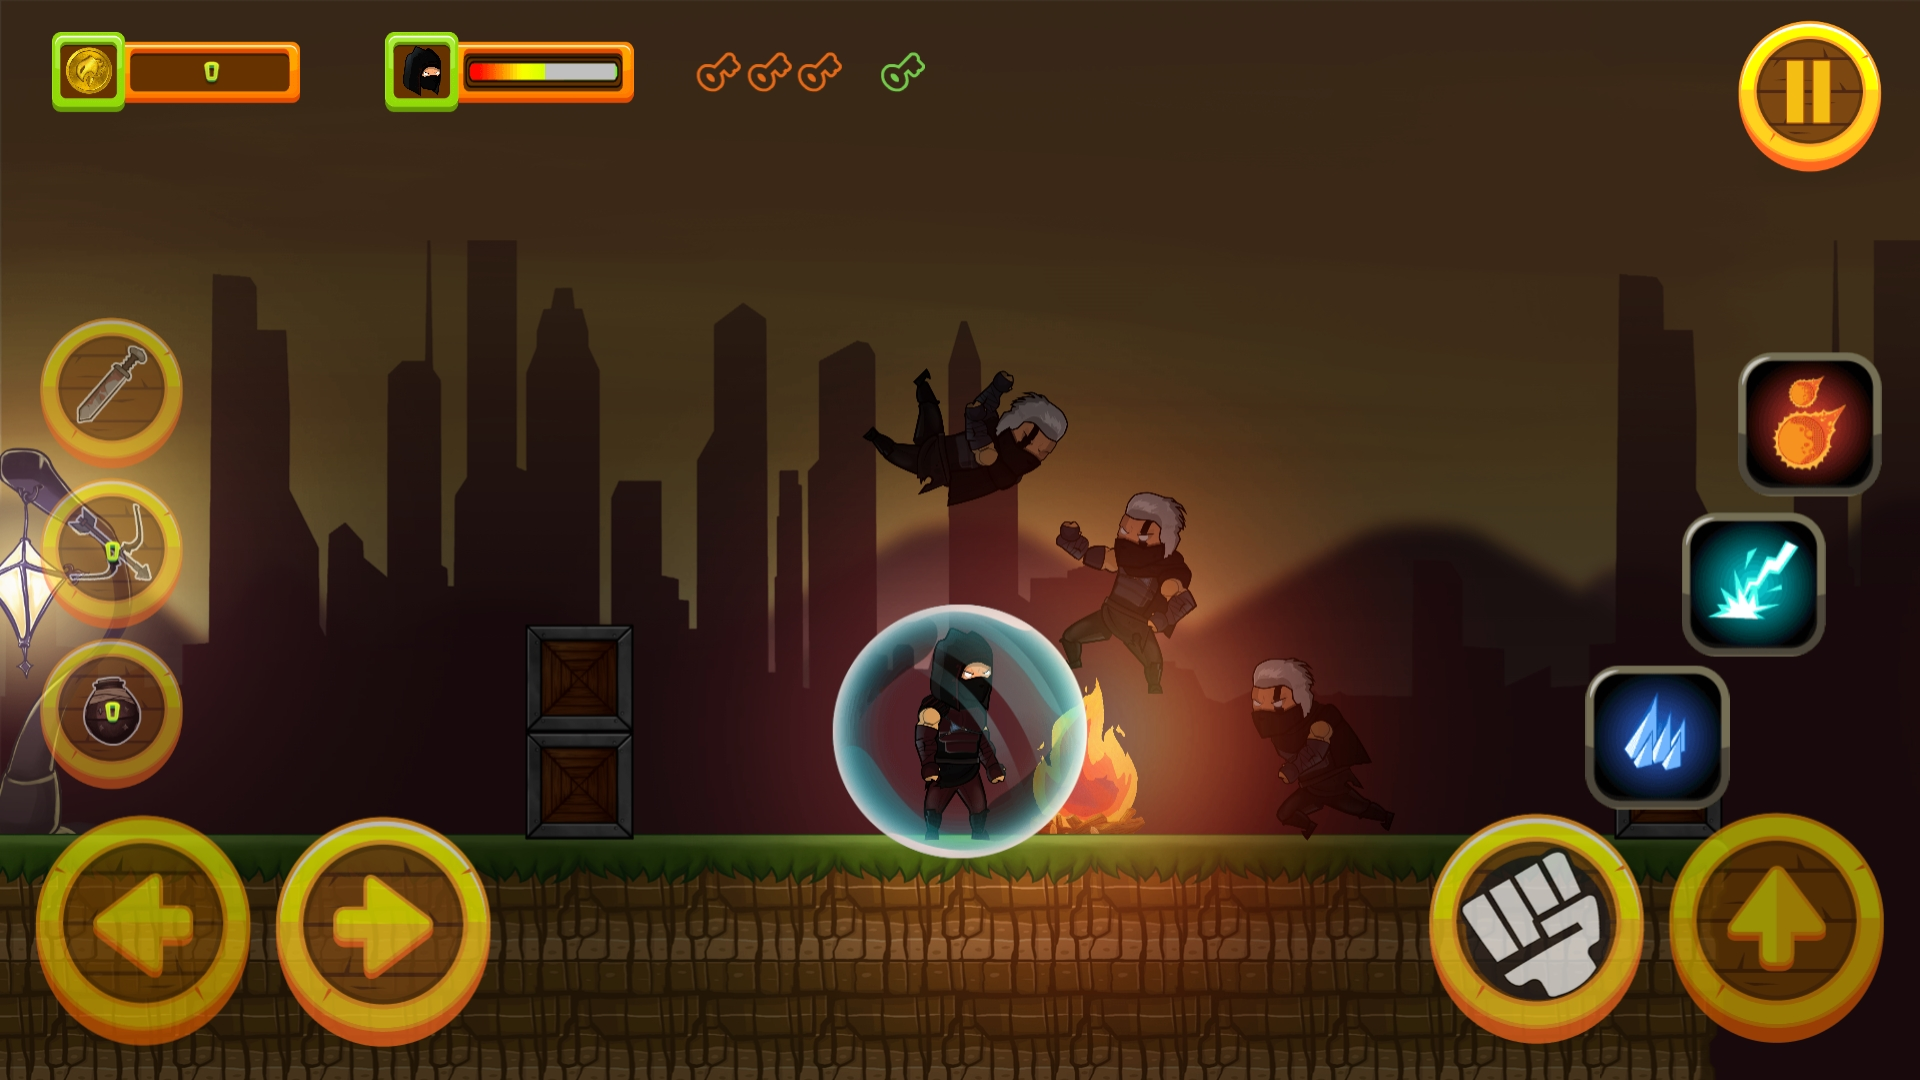 Black Assassin - HTML5 Game + Mobile Version (Construct 3 / C3P) - 12